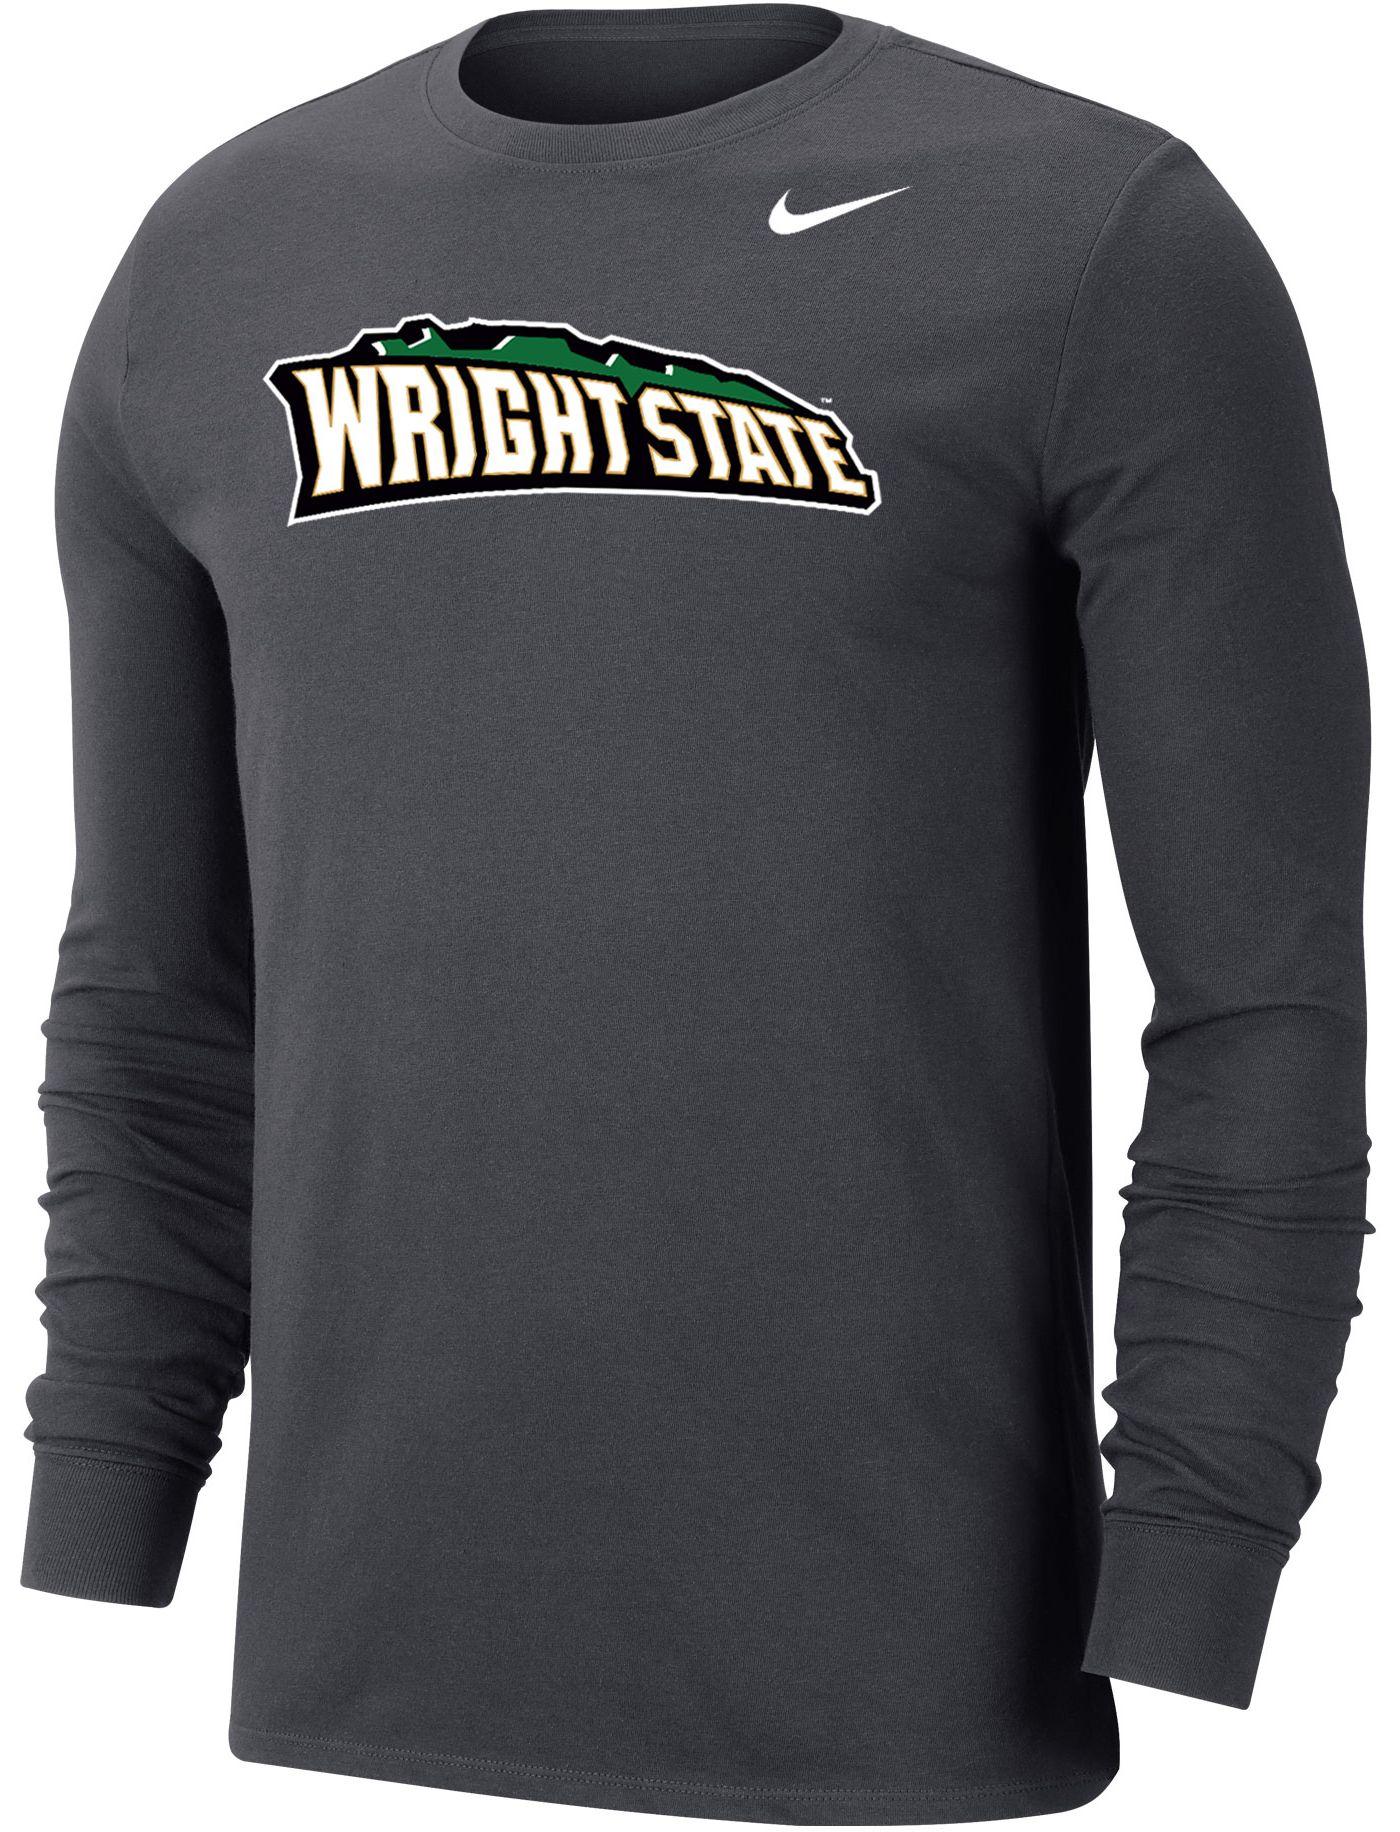 Nike Men's Wright State Raiders Grey Wordmark Long Sleeve T-Shirt